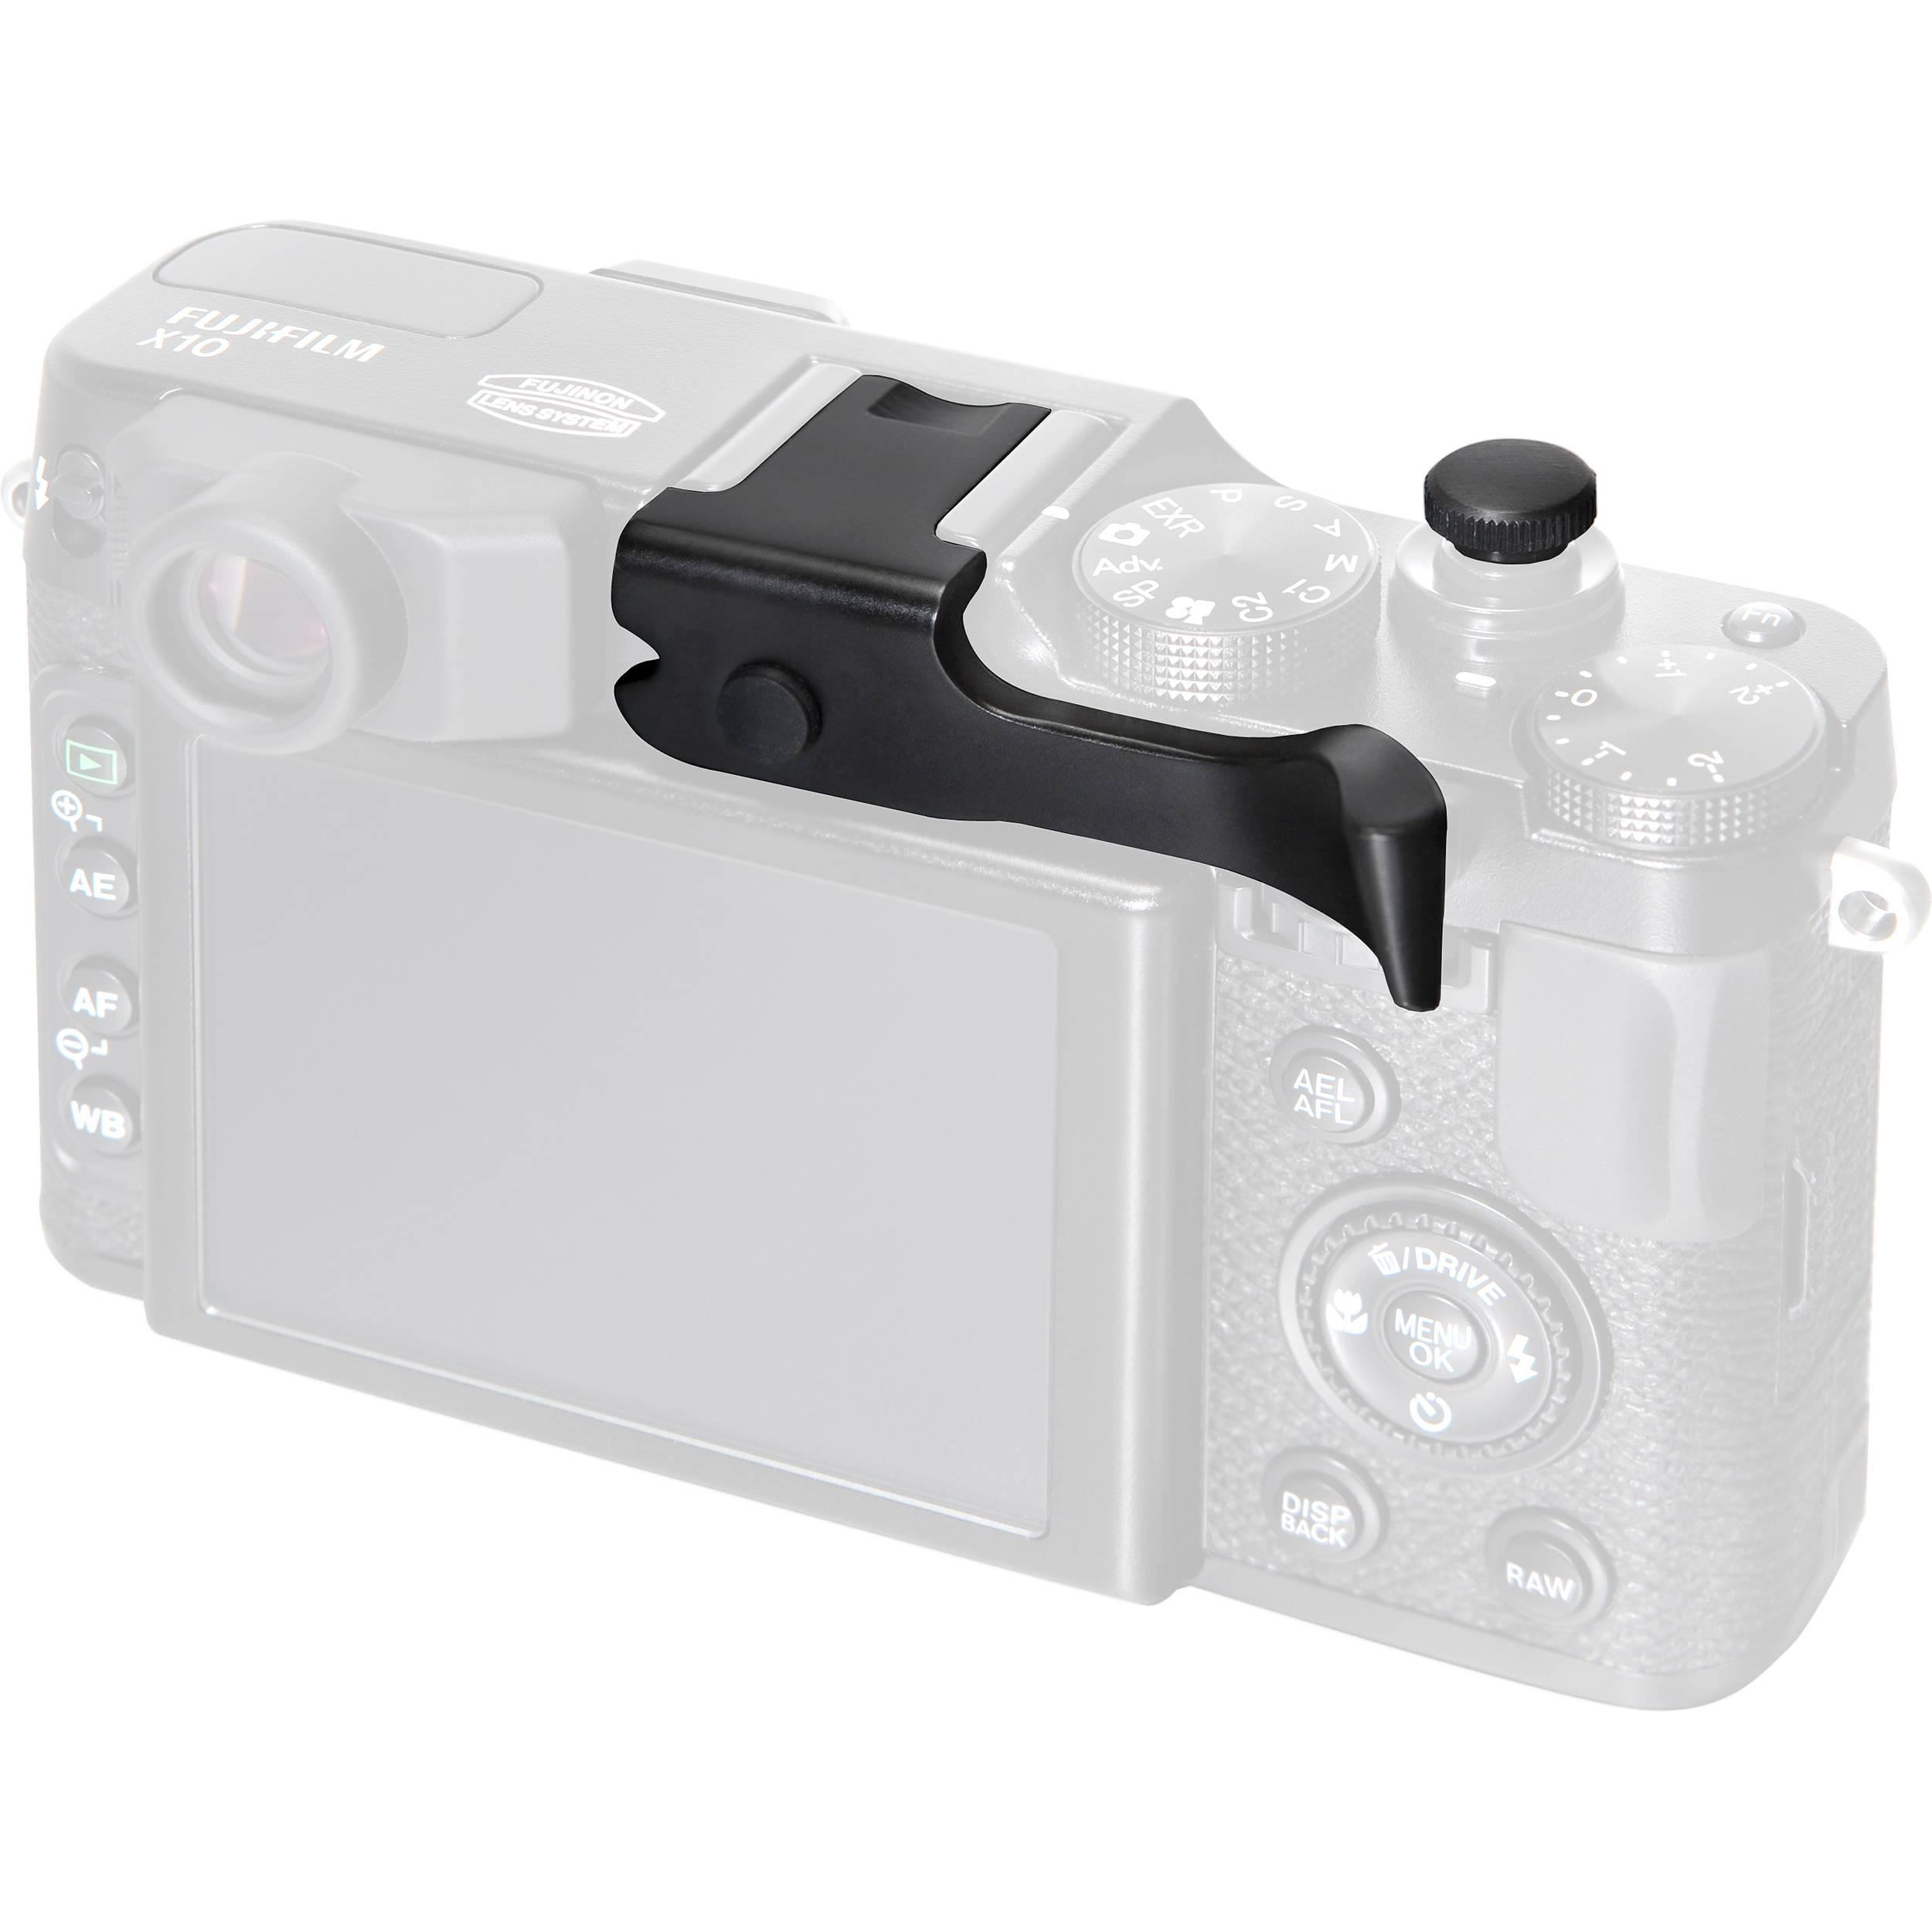 Fujifilm X100 X100s Ergonomic Extension Kit Black 600012332 Camera Iphone 5 Custom Hard Case